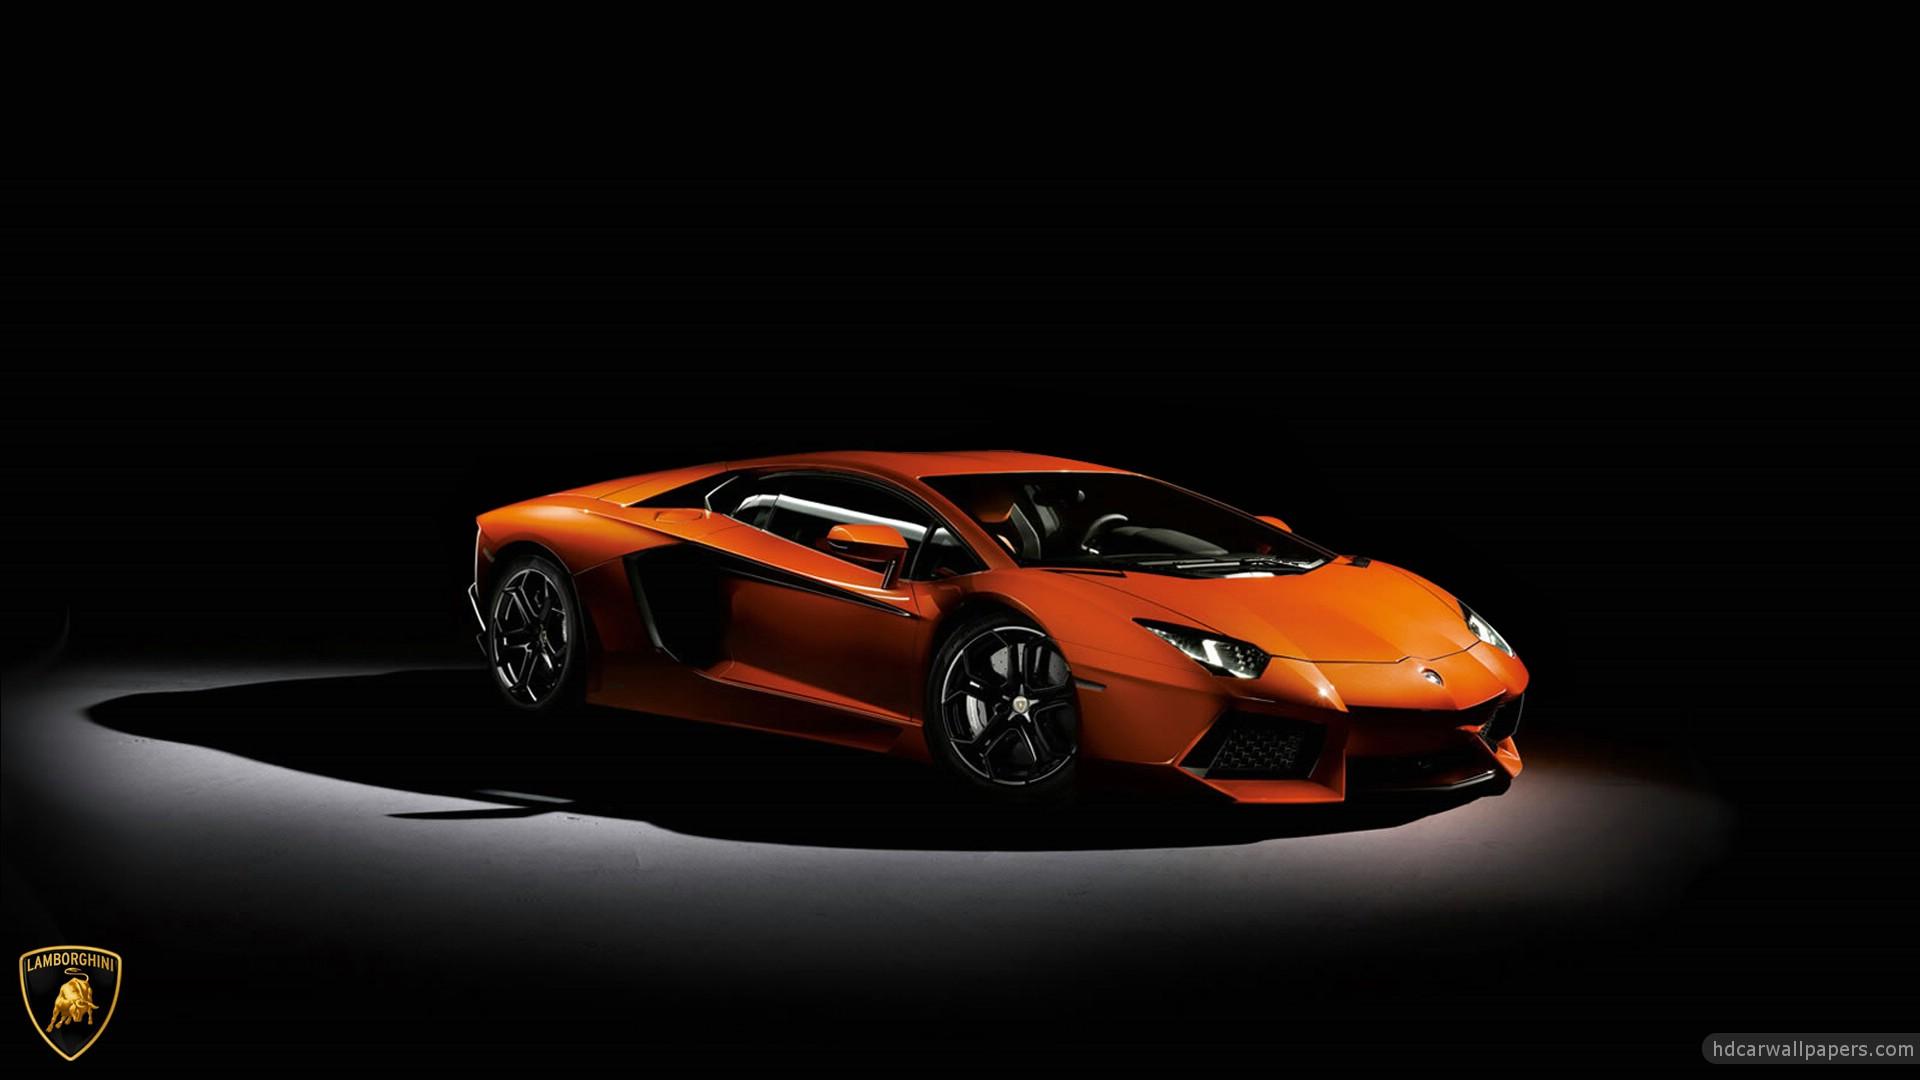 Lamborghini Aventador HD Wallpaper HD Car Wallpapers 1920x1080